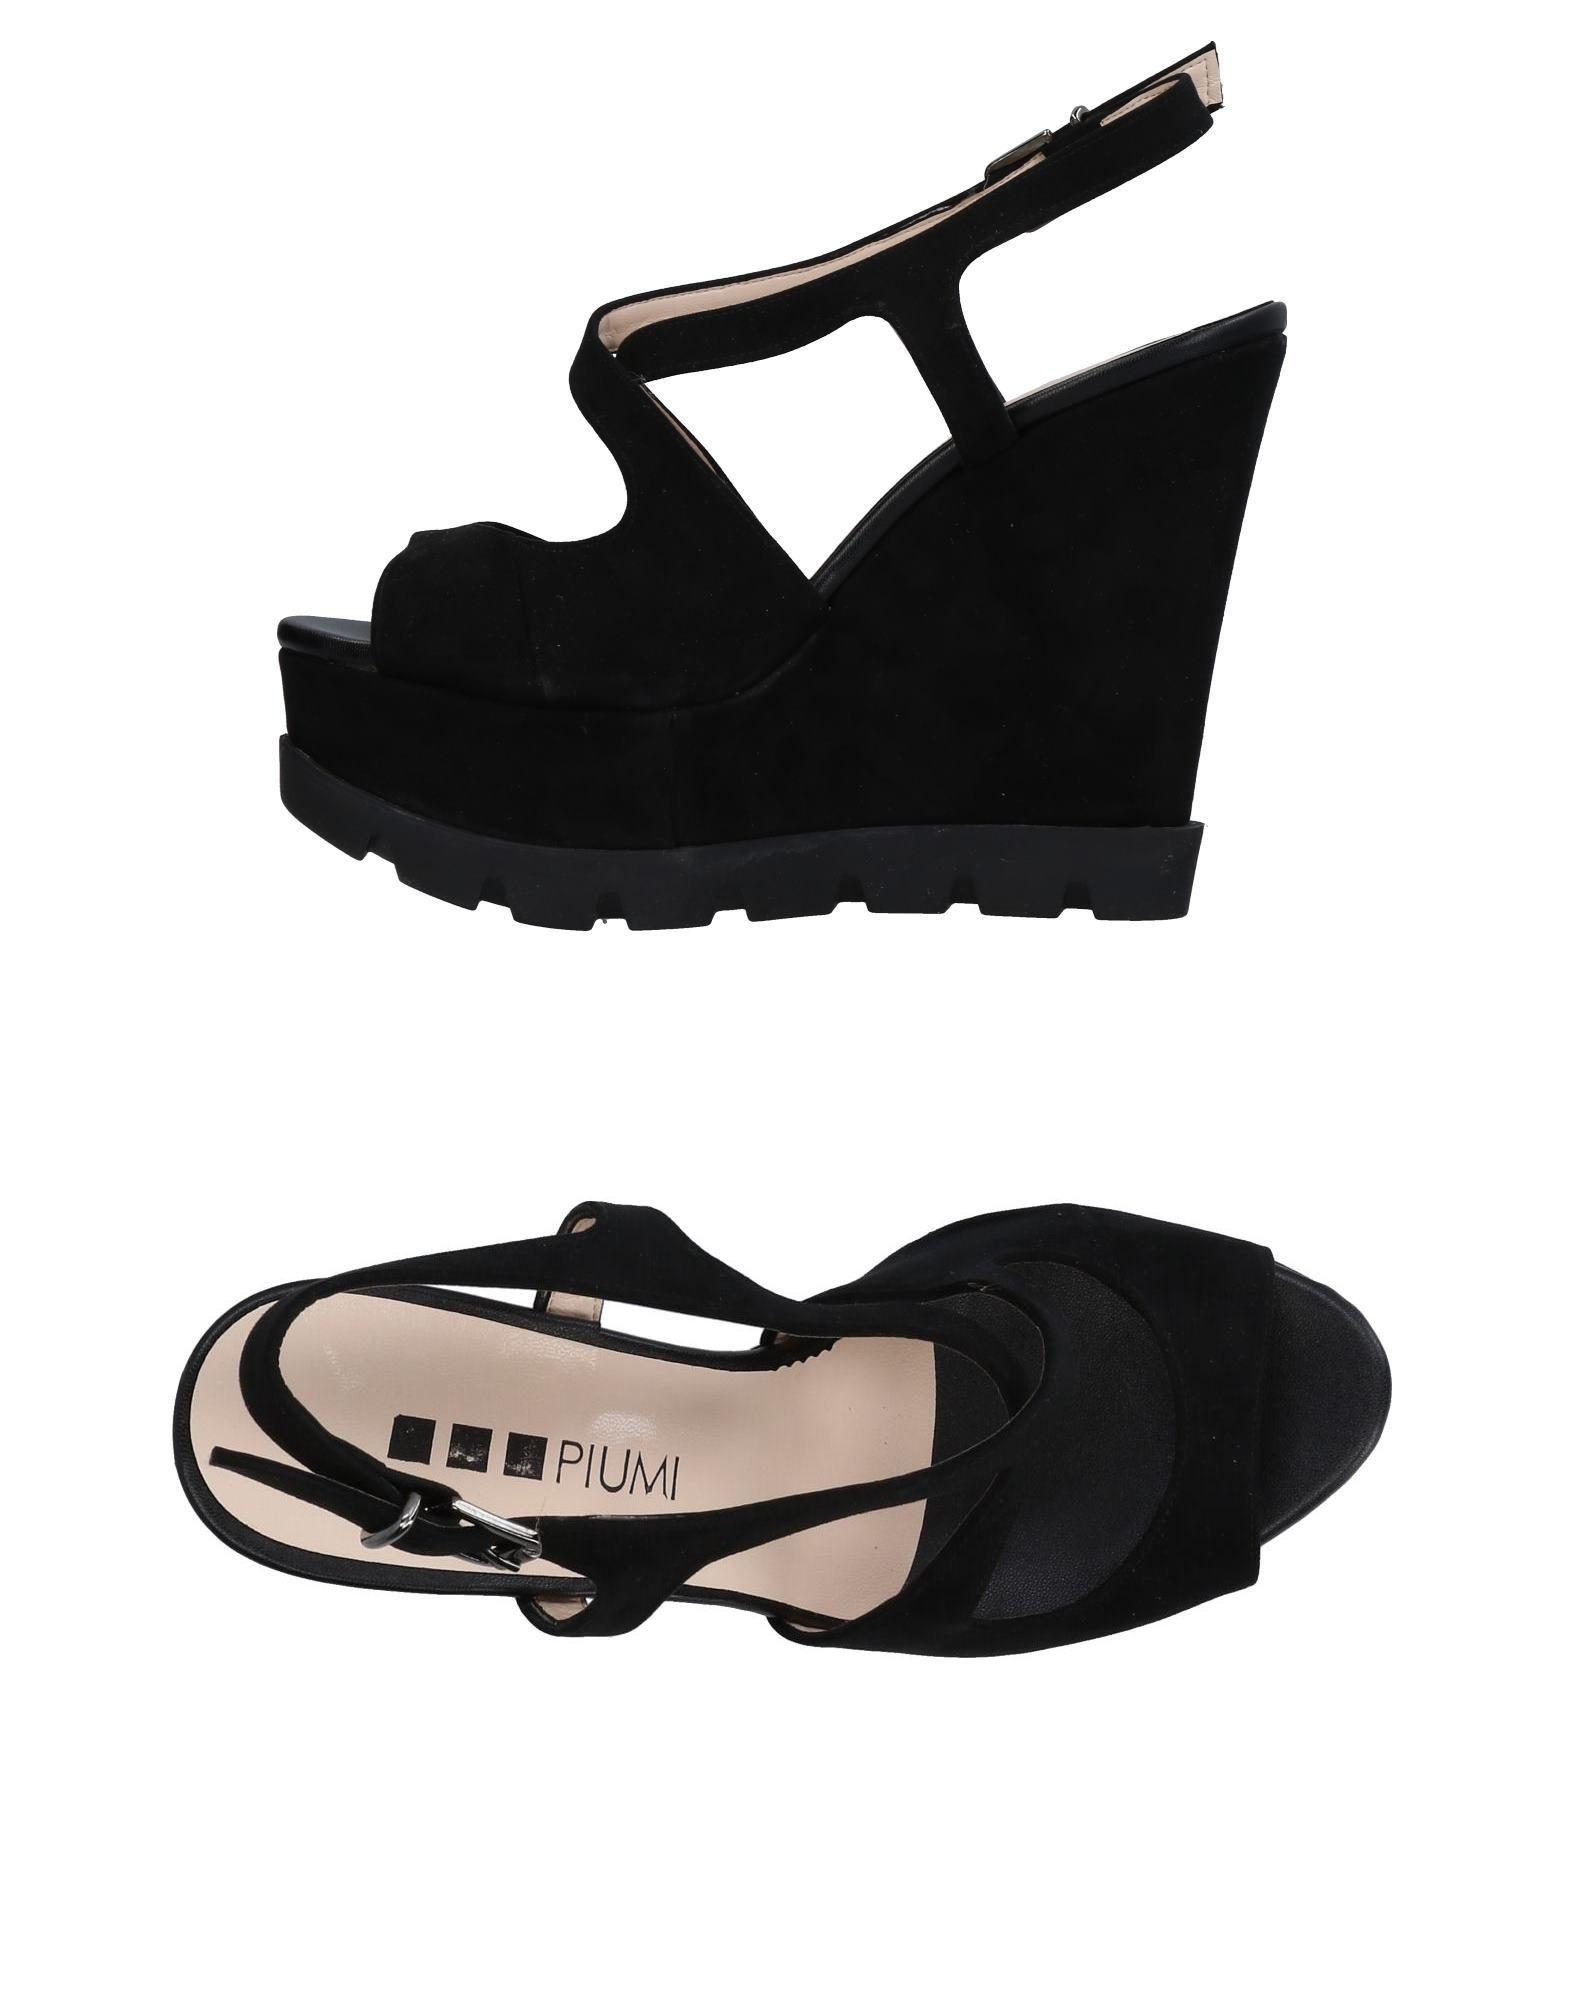 Piumi Sandalen Damen  11458022LA Gute Qualität beliebte Schuhe